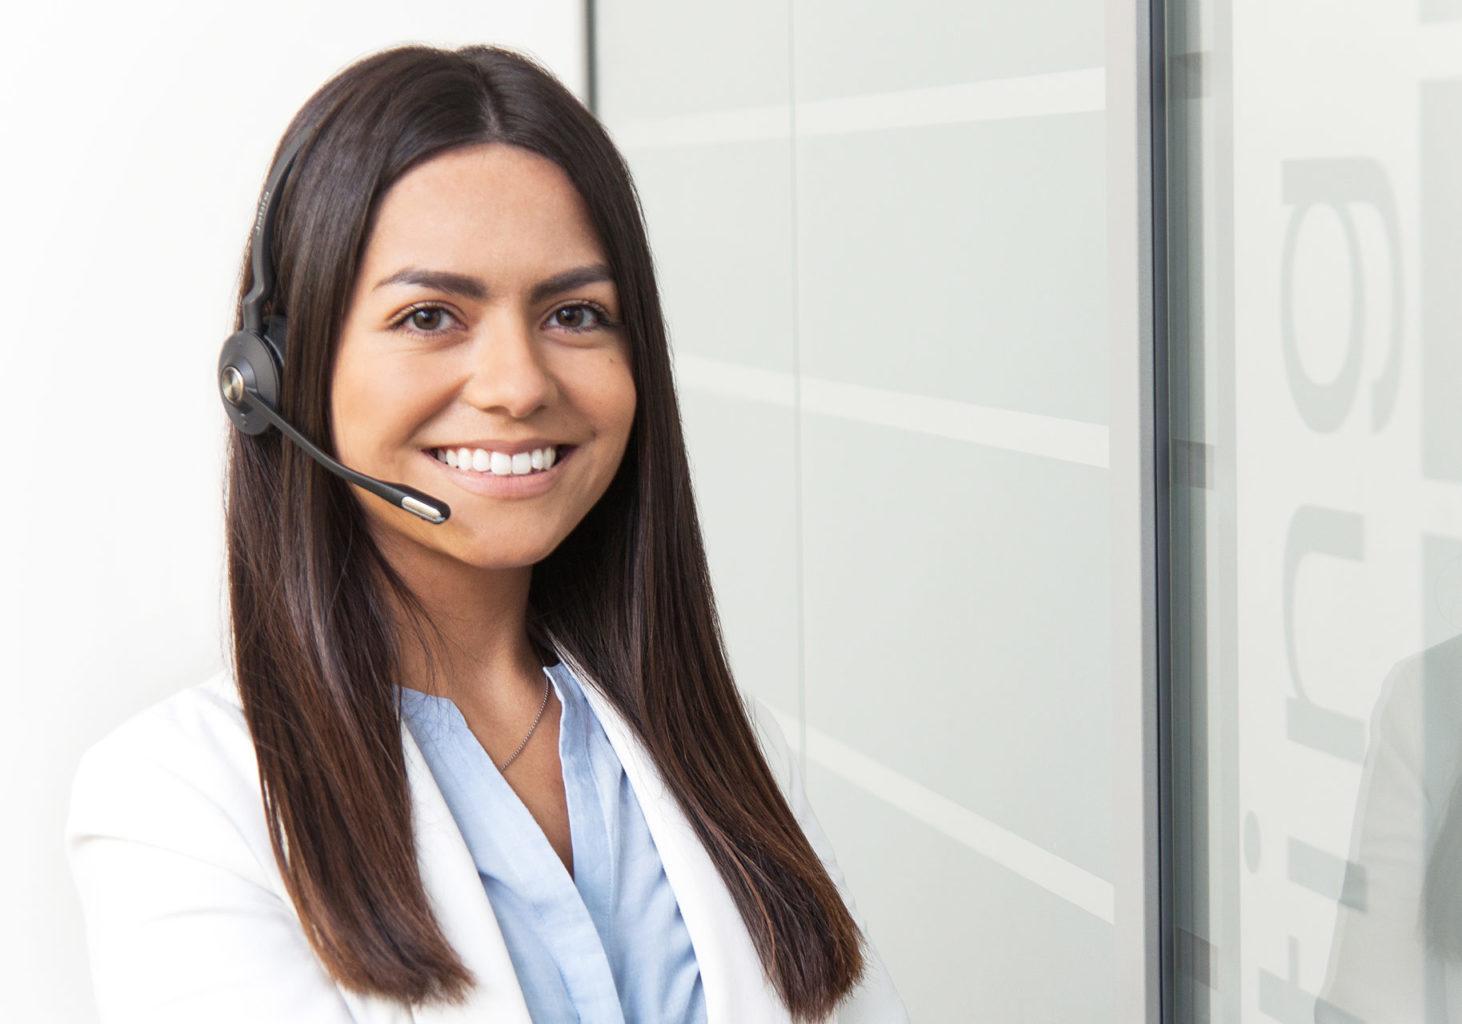 Baust Gruppe Kontakt